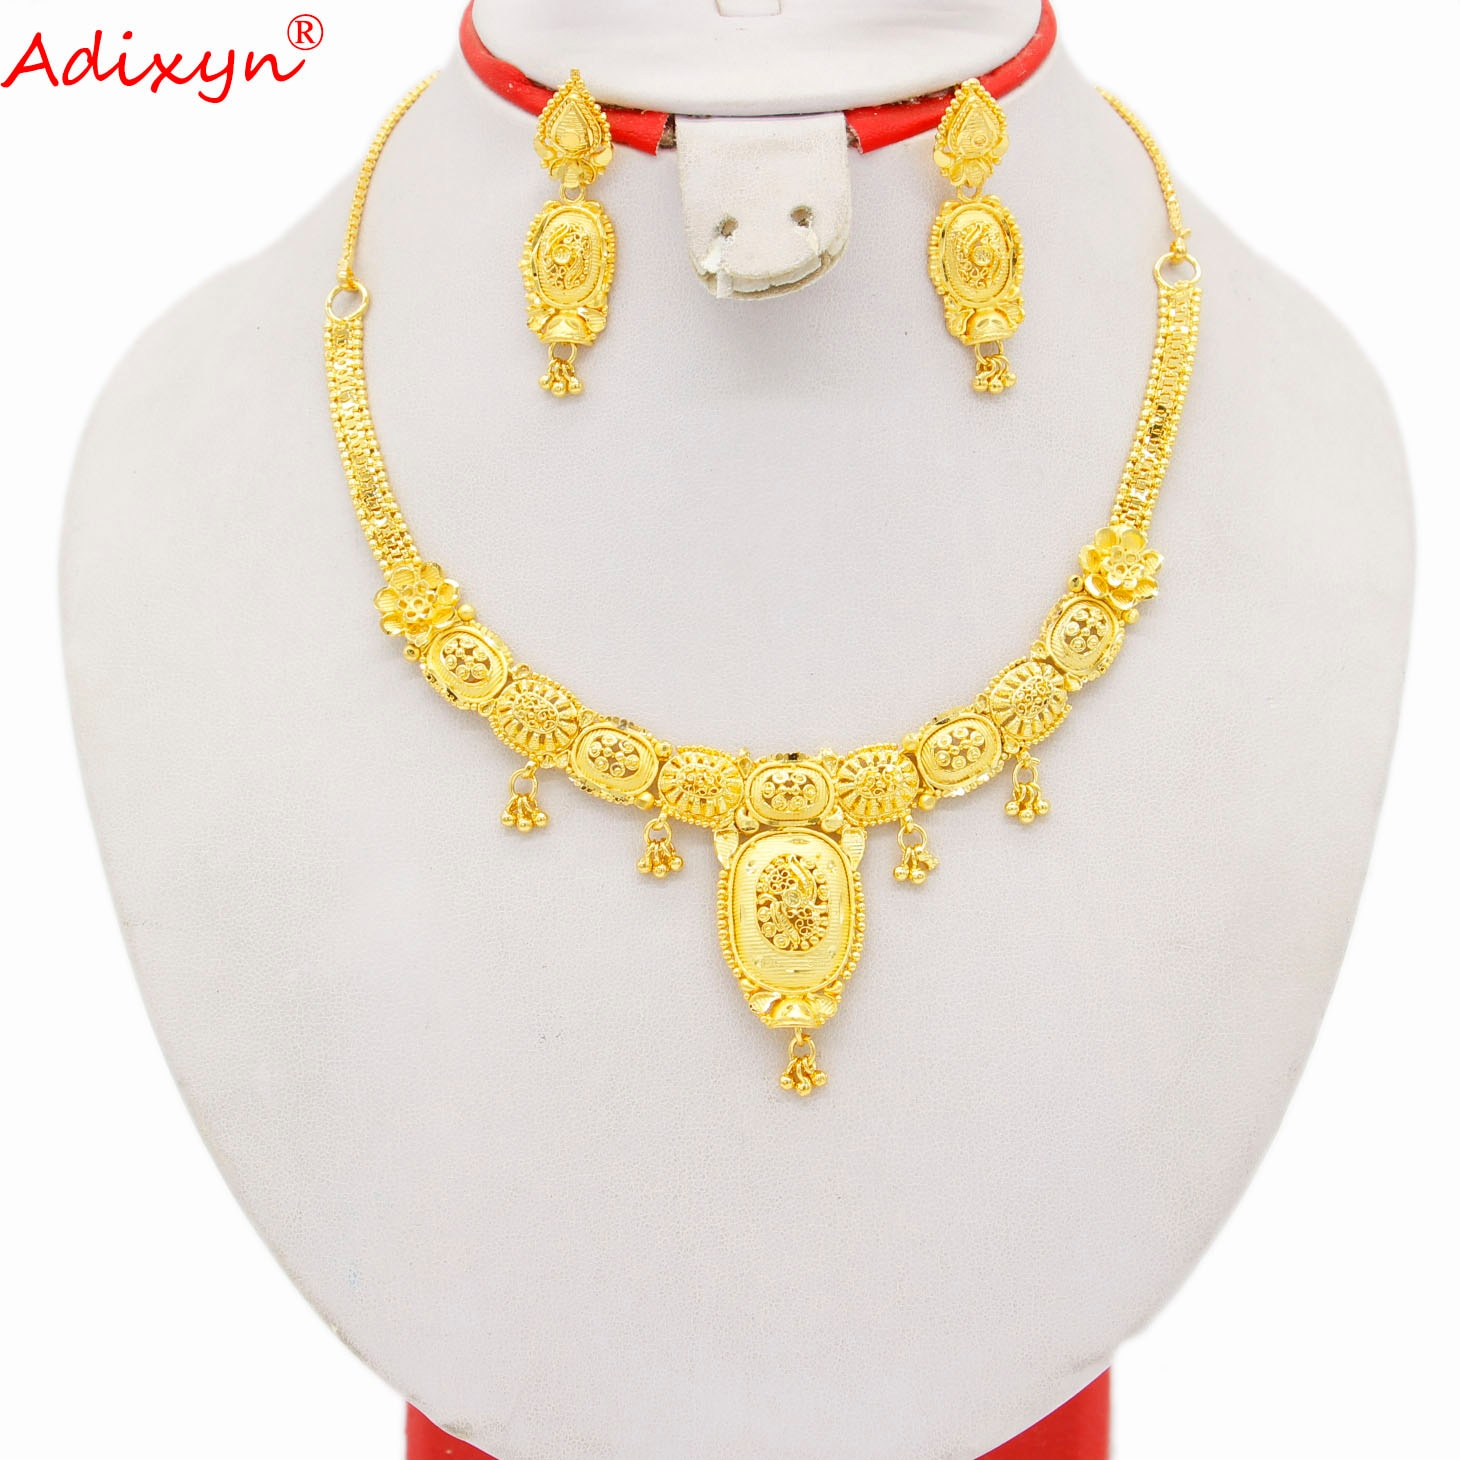 Adixyn دبي الفاخرة 24K الذهب اللون/أقراط نحاسية قلادة طقم مجوهرات للنساء/بنات الاثيوبية مجوهرات حفلة أفريقية هدايا